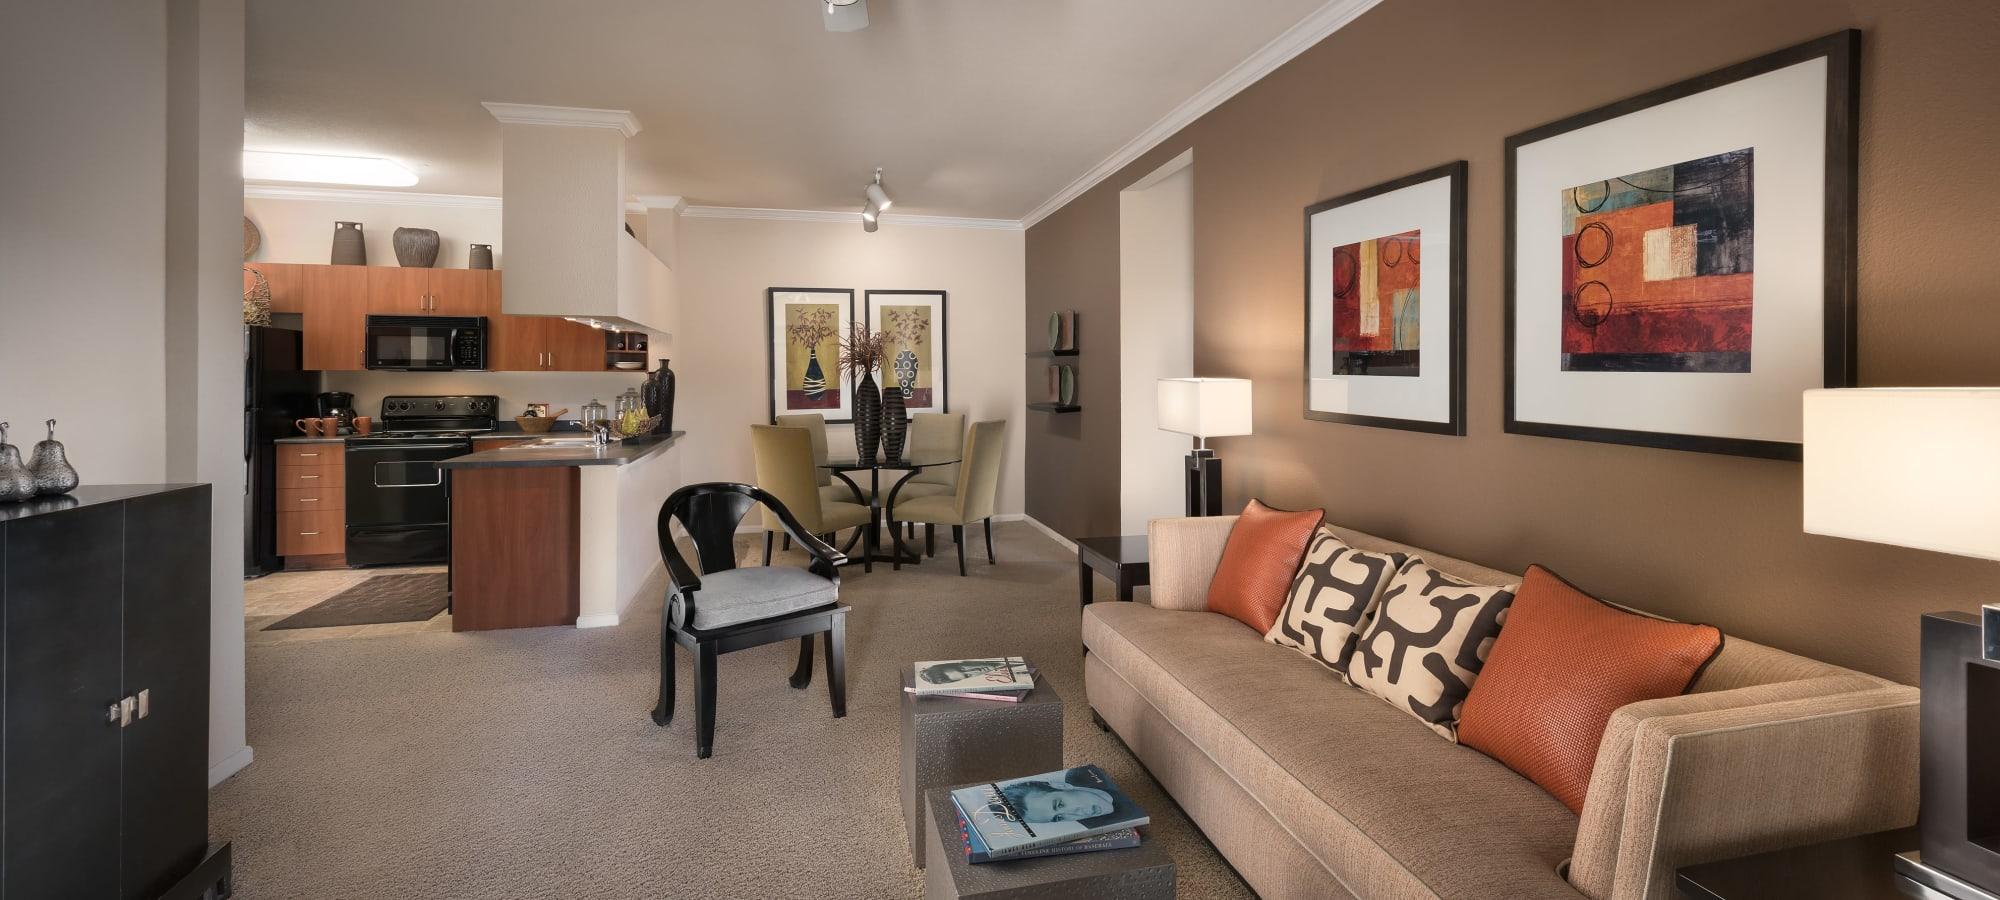 Welcoming living room at Azul at Spectrum in Gilbert, Arizona